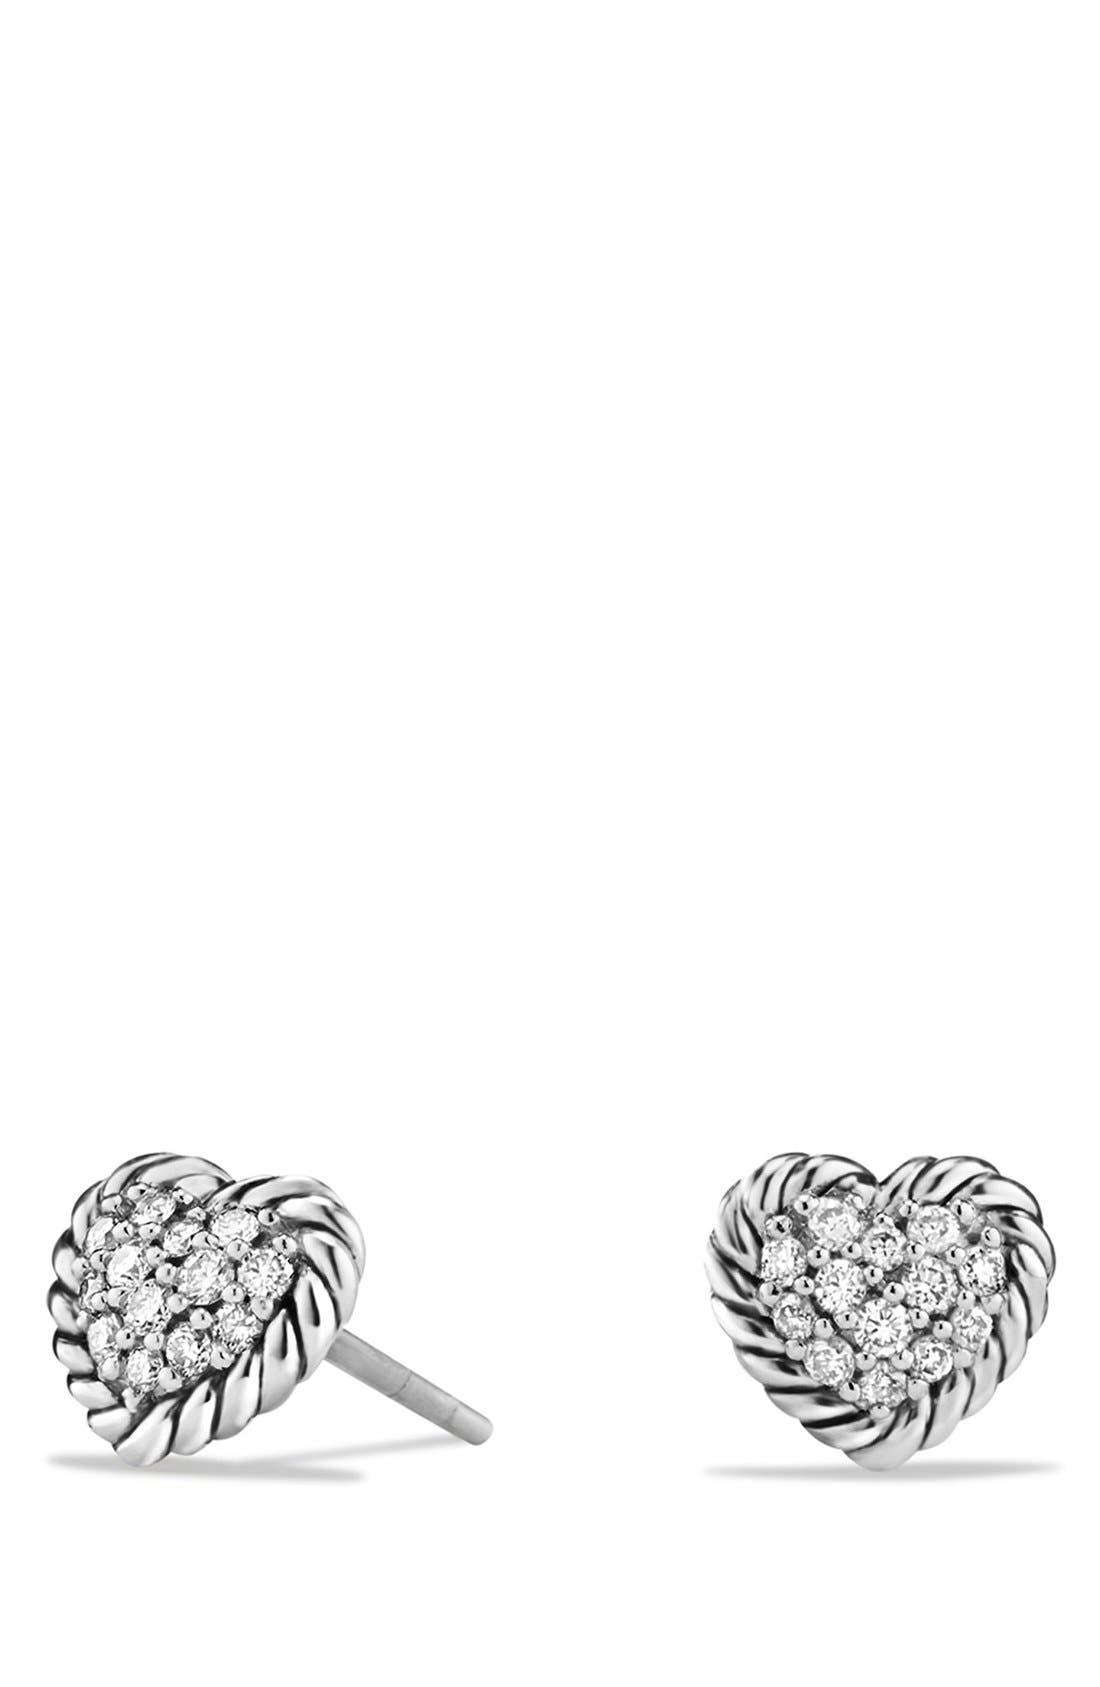 DAVID YURMAN,                             'Châtelaine' Heart Earrings with Diamonds,                             Main thumbnail 1, color,                             SILVER